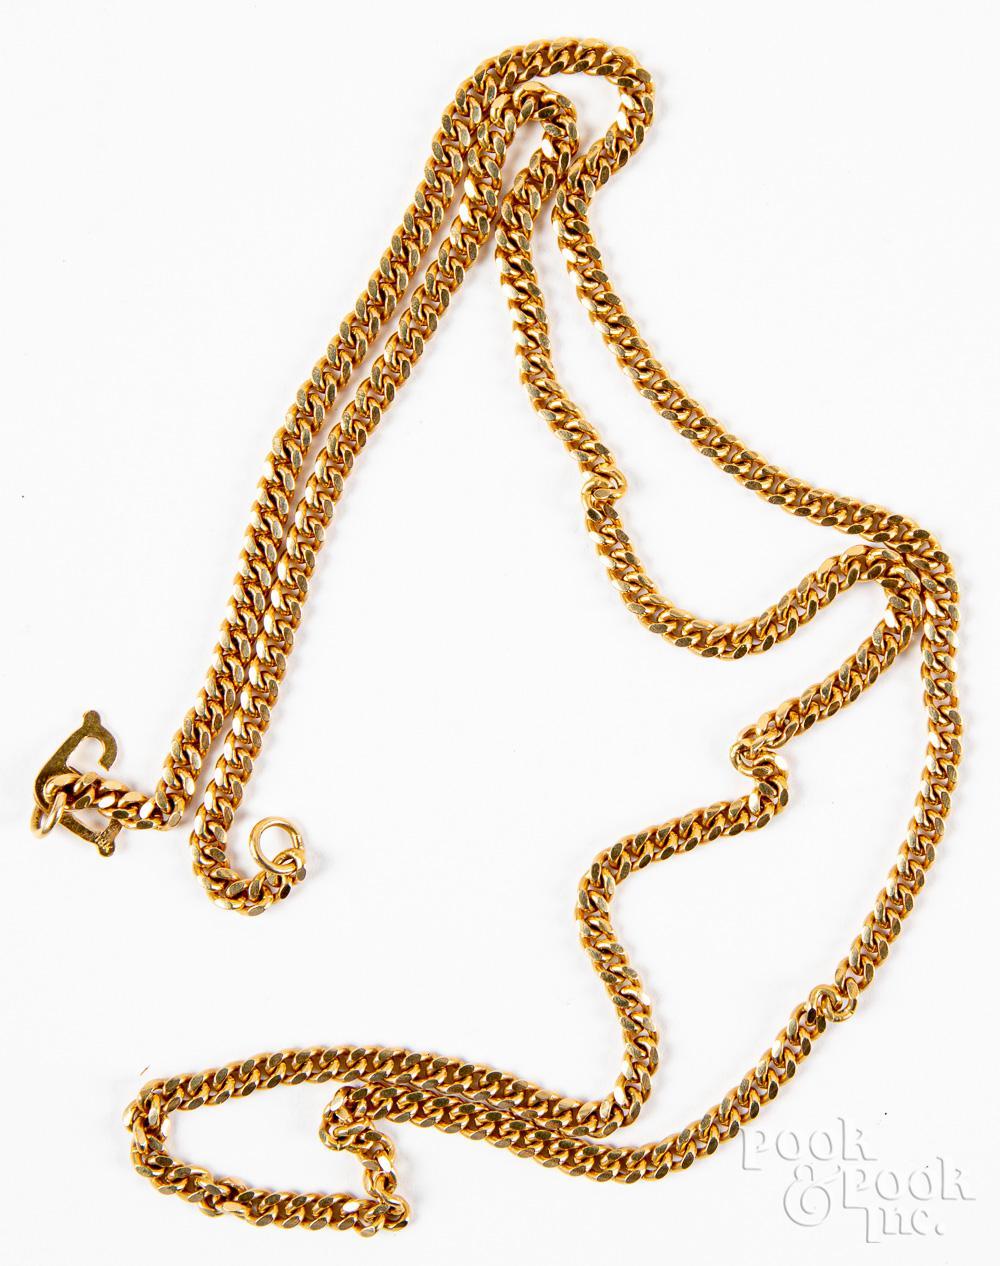 18K gold necklace, 17.2dwt.